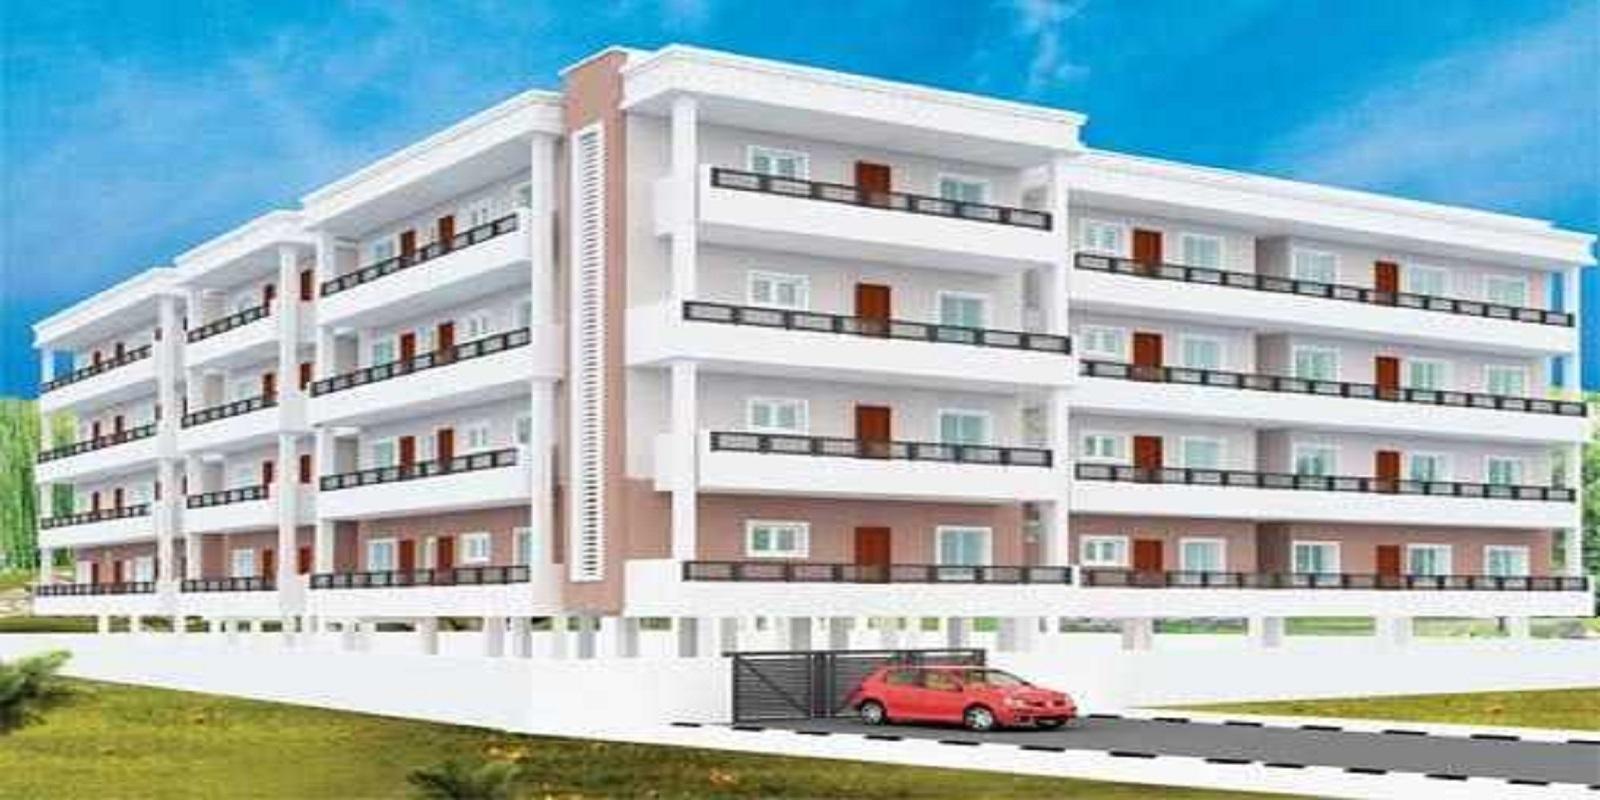 arvinds arkavathi project project large image1